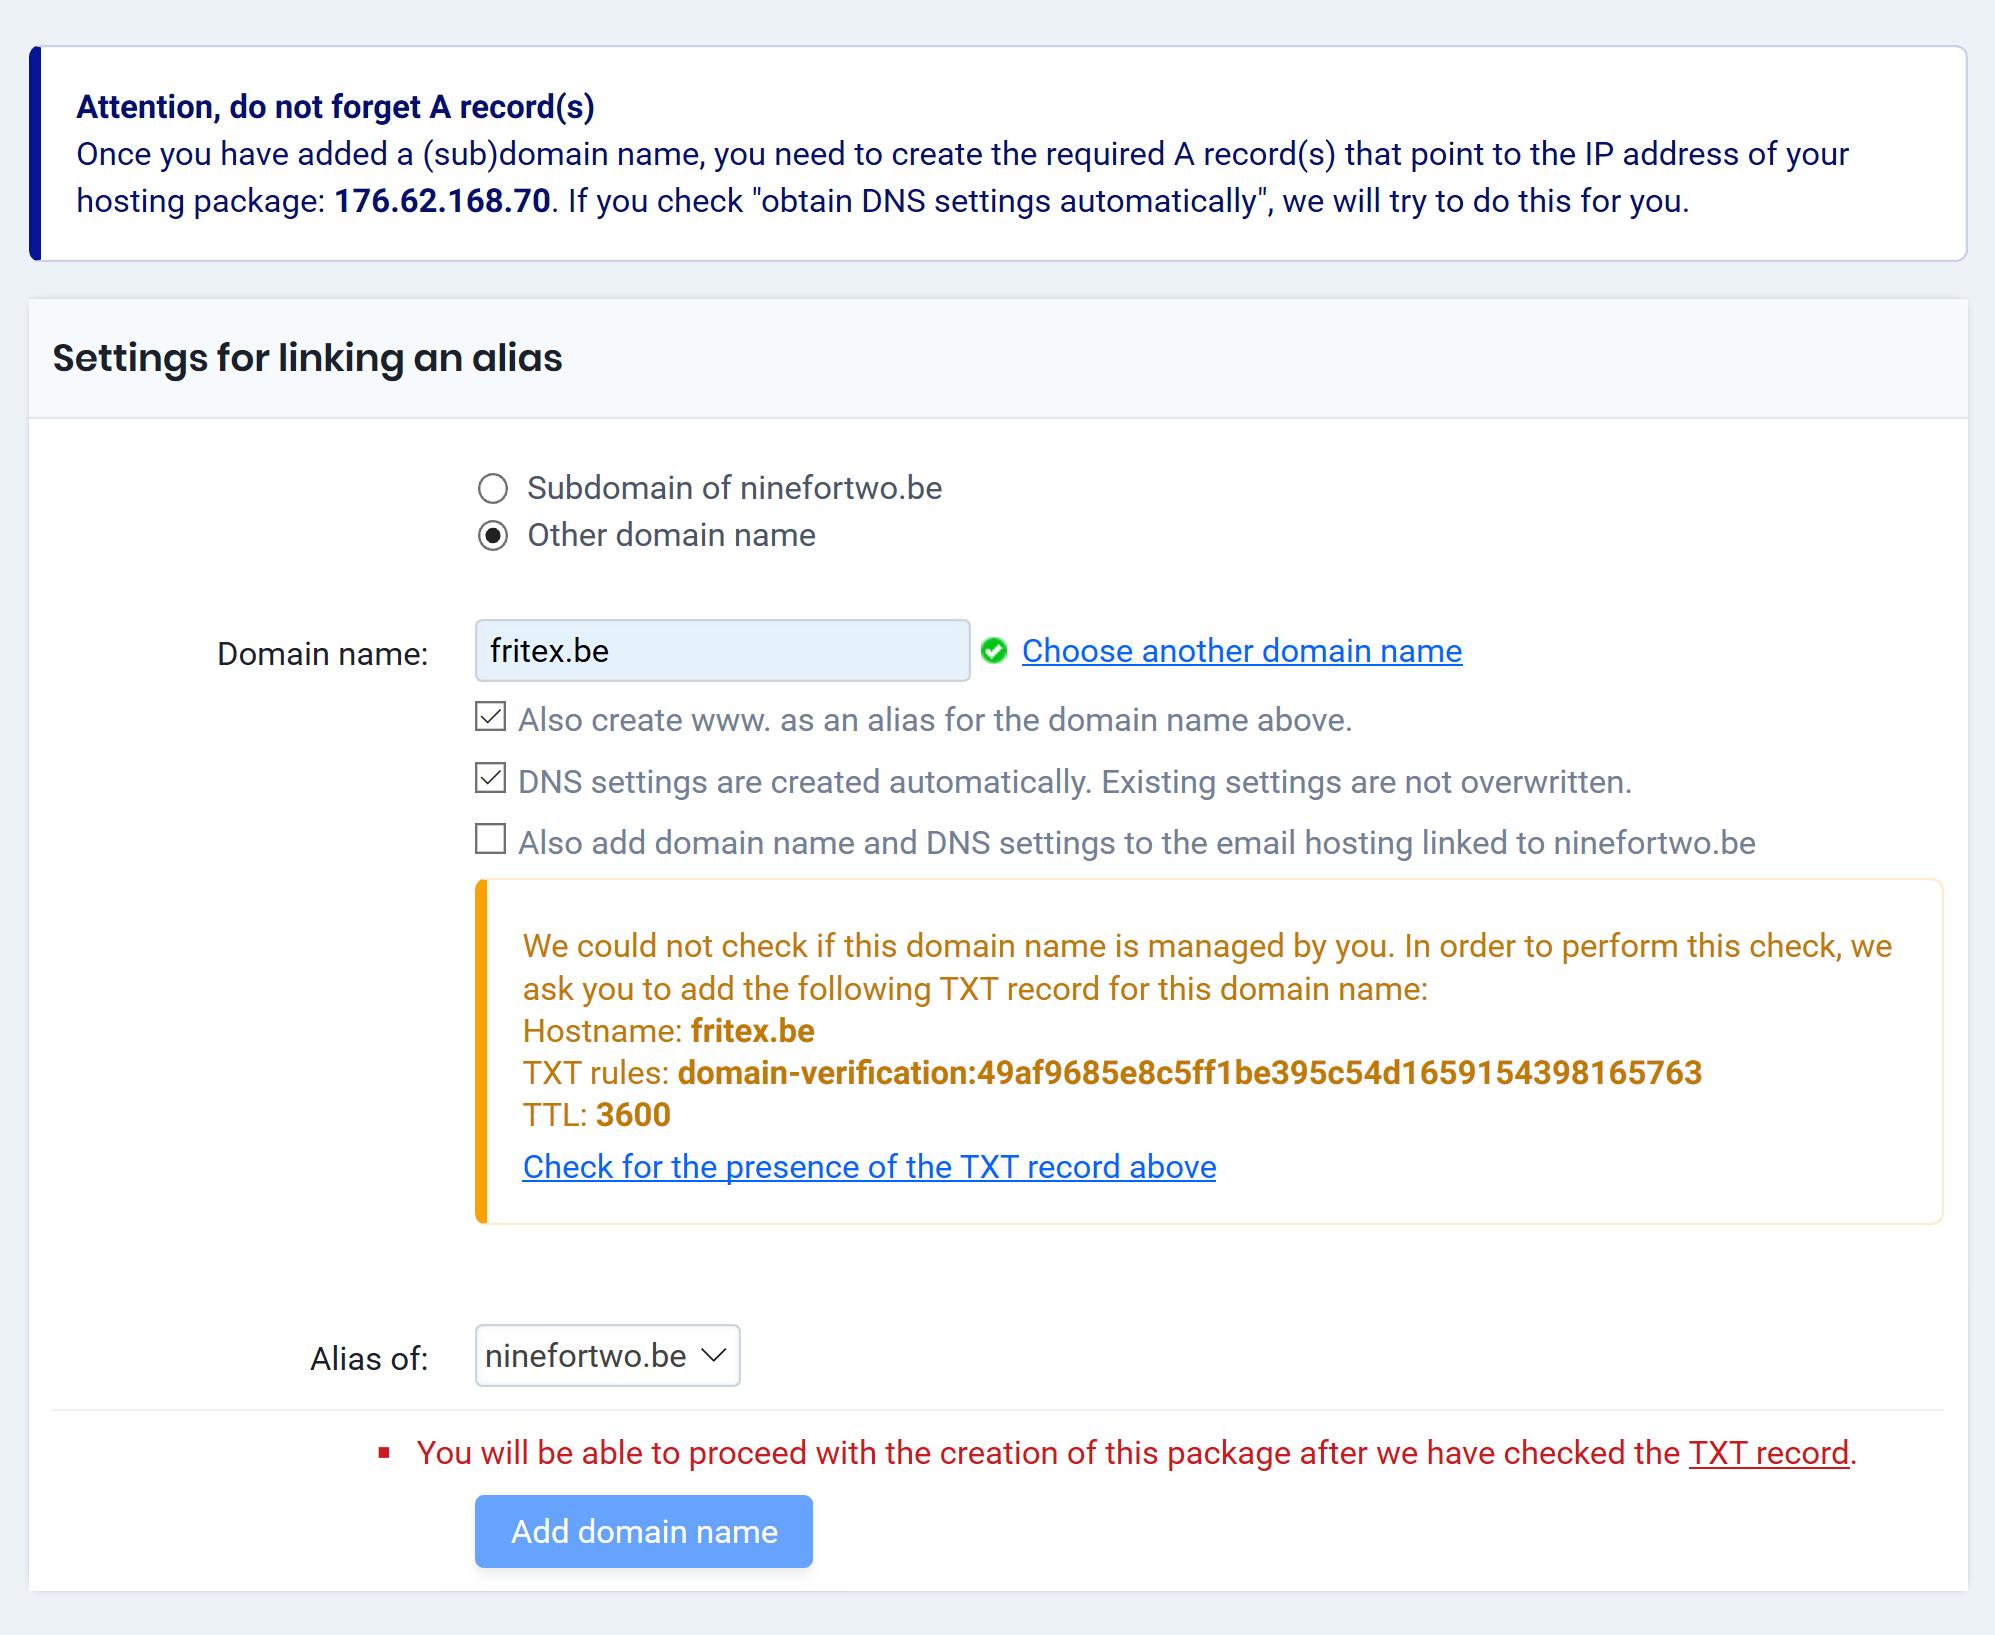 Settings for linking alias